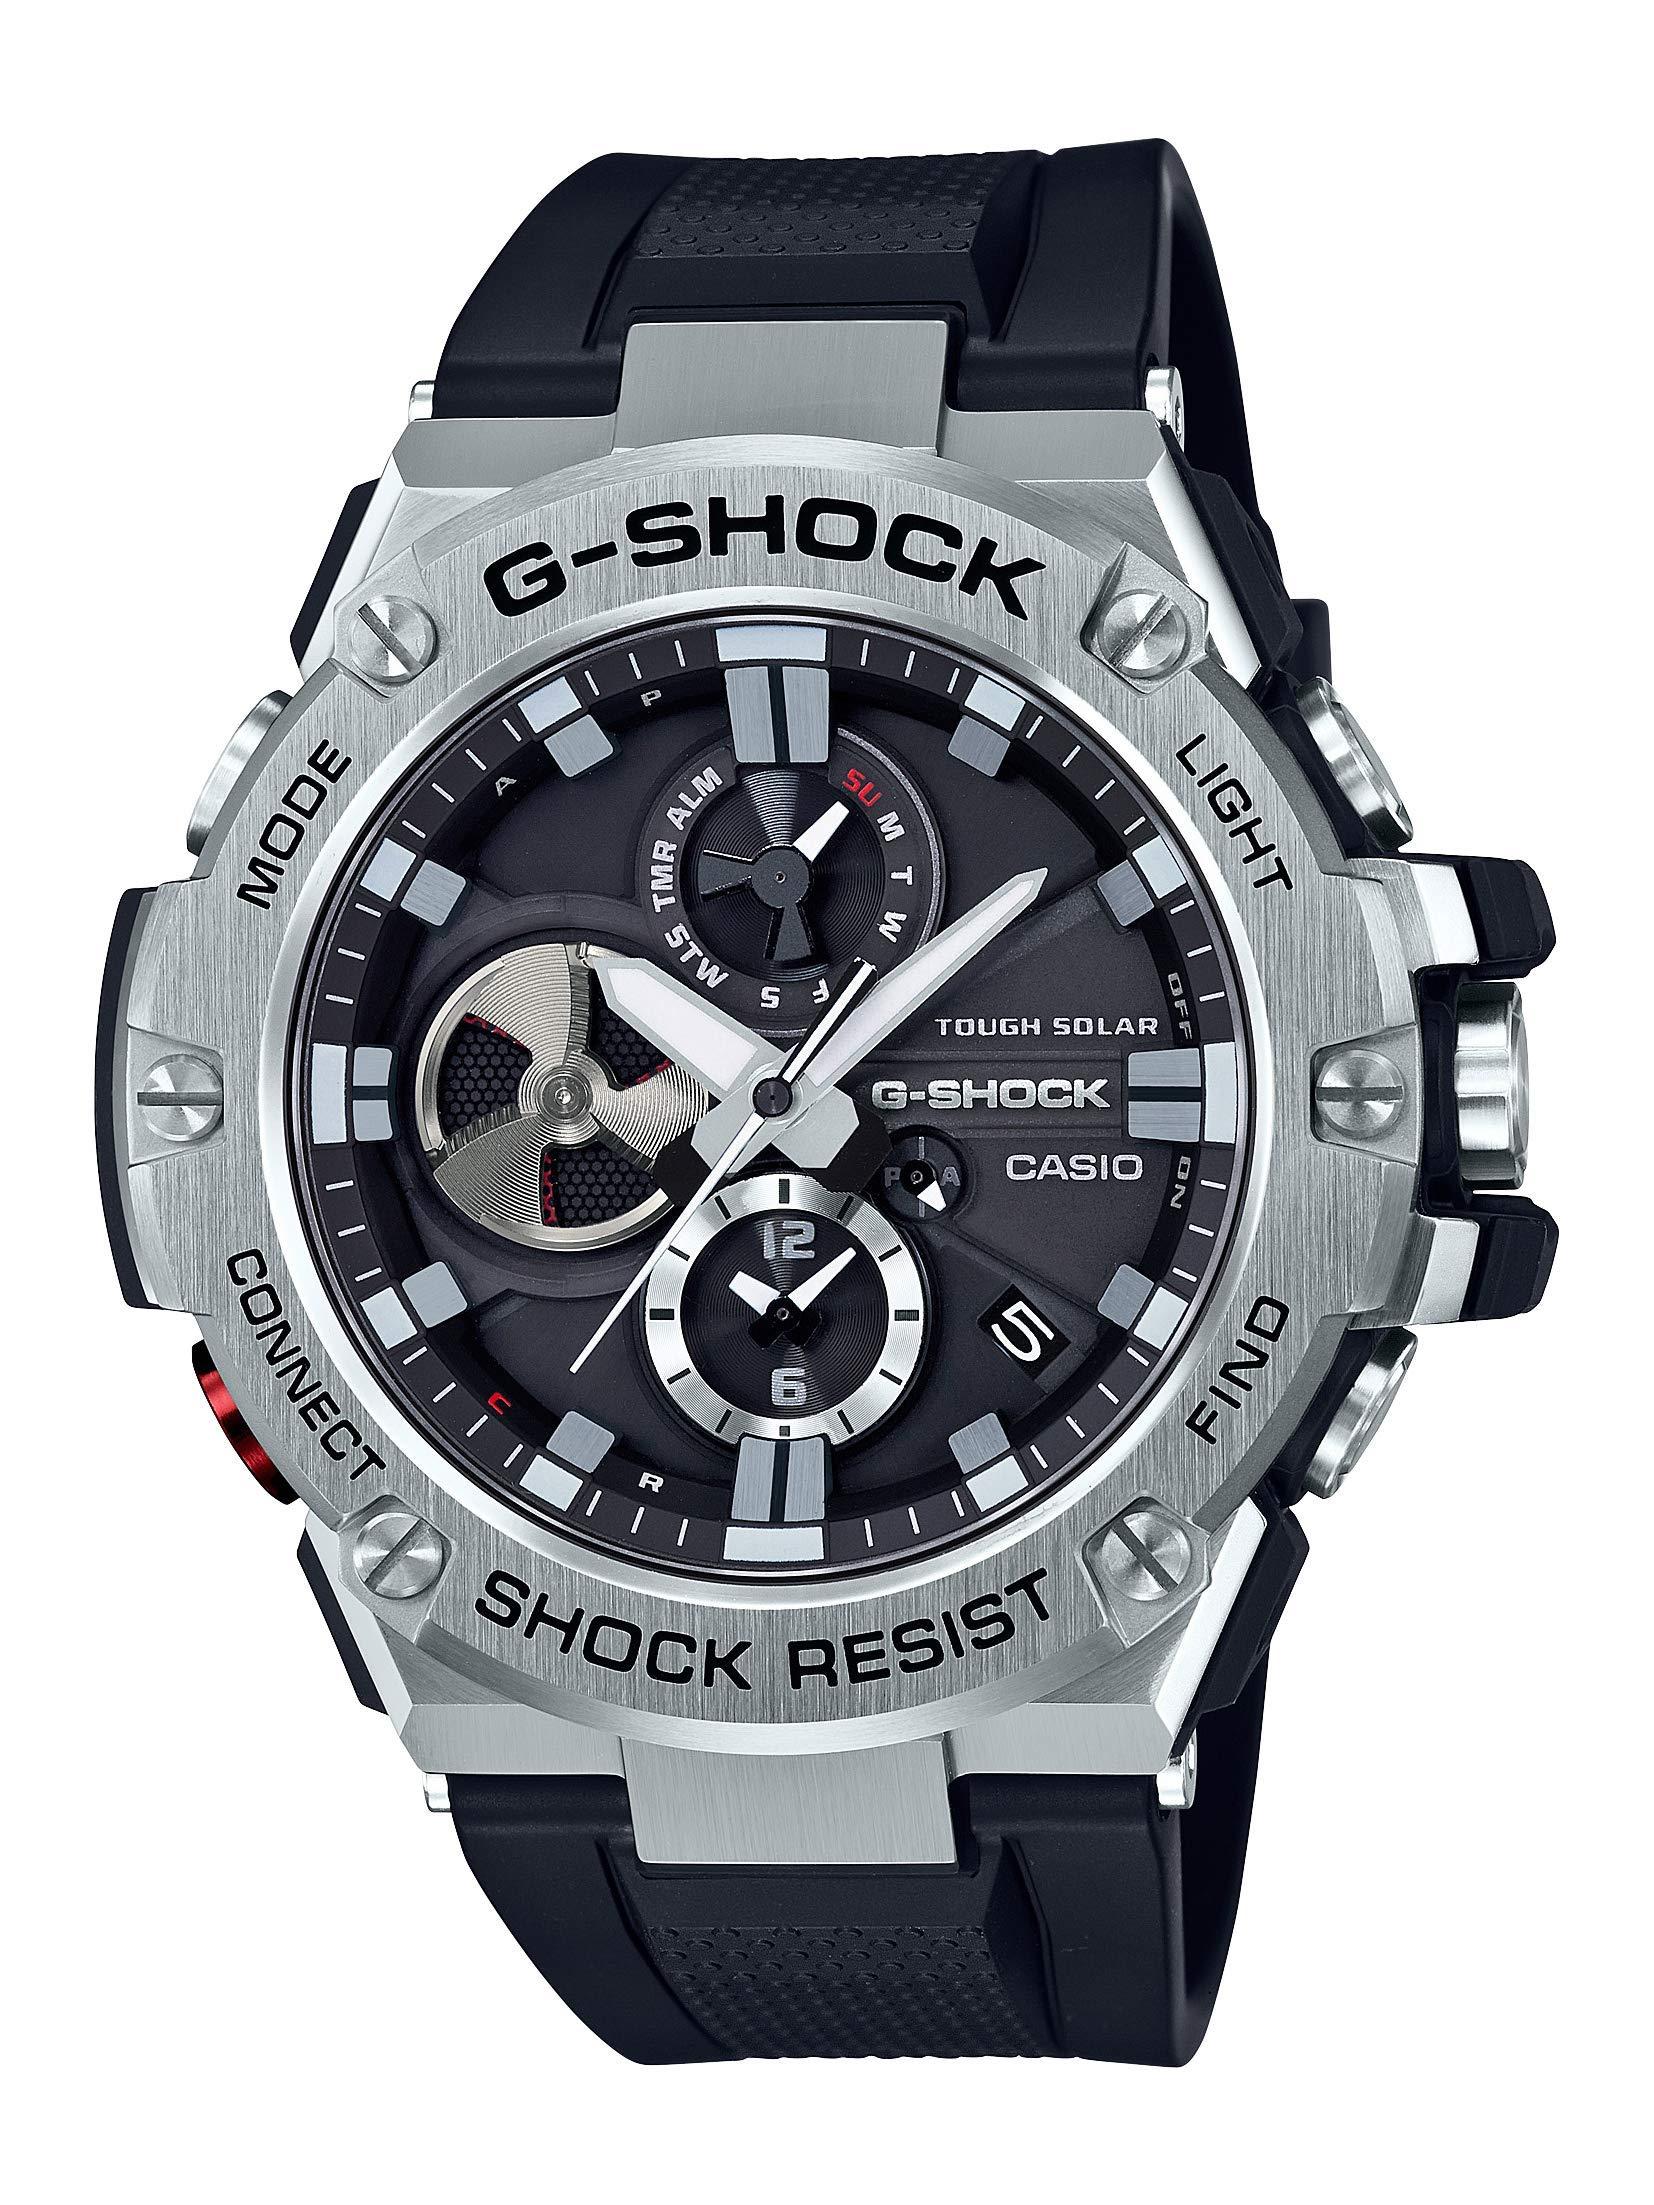 Casio G Steel G Shock Bluetooth Connected